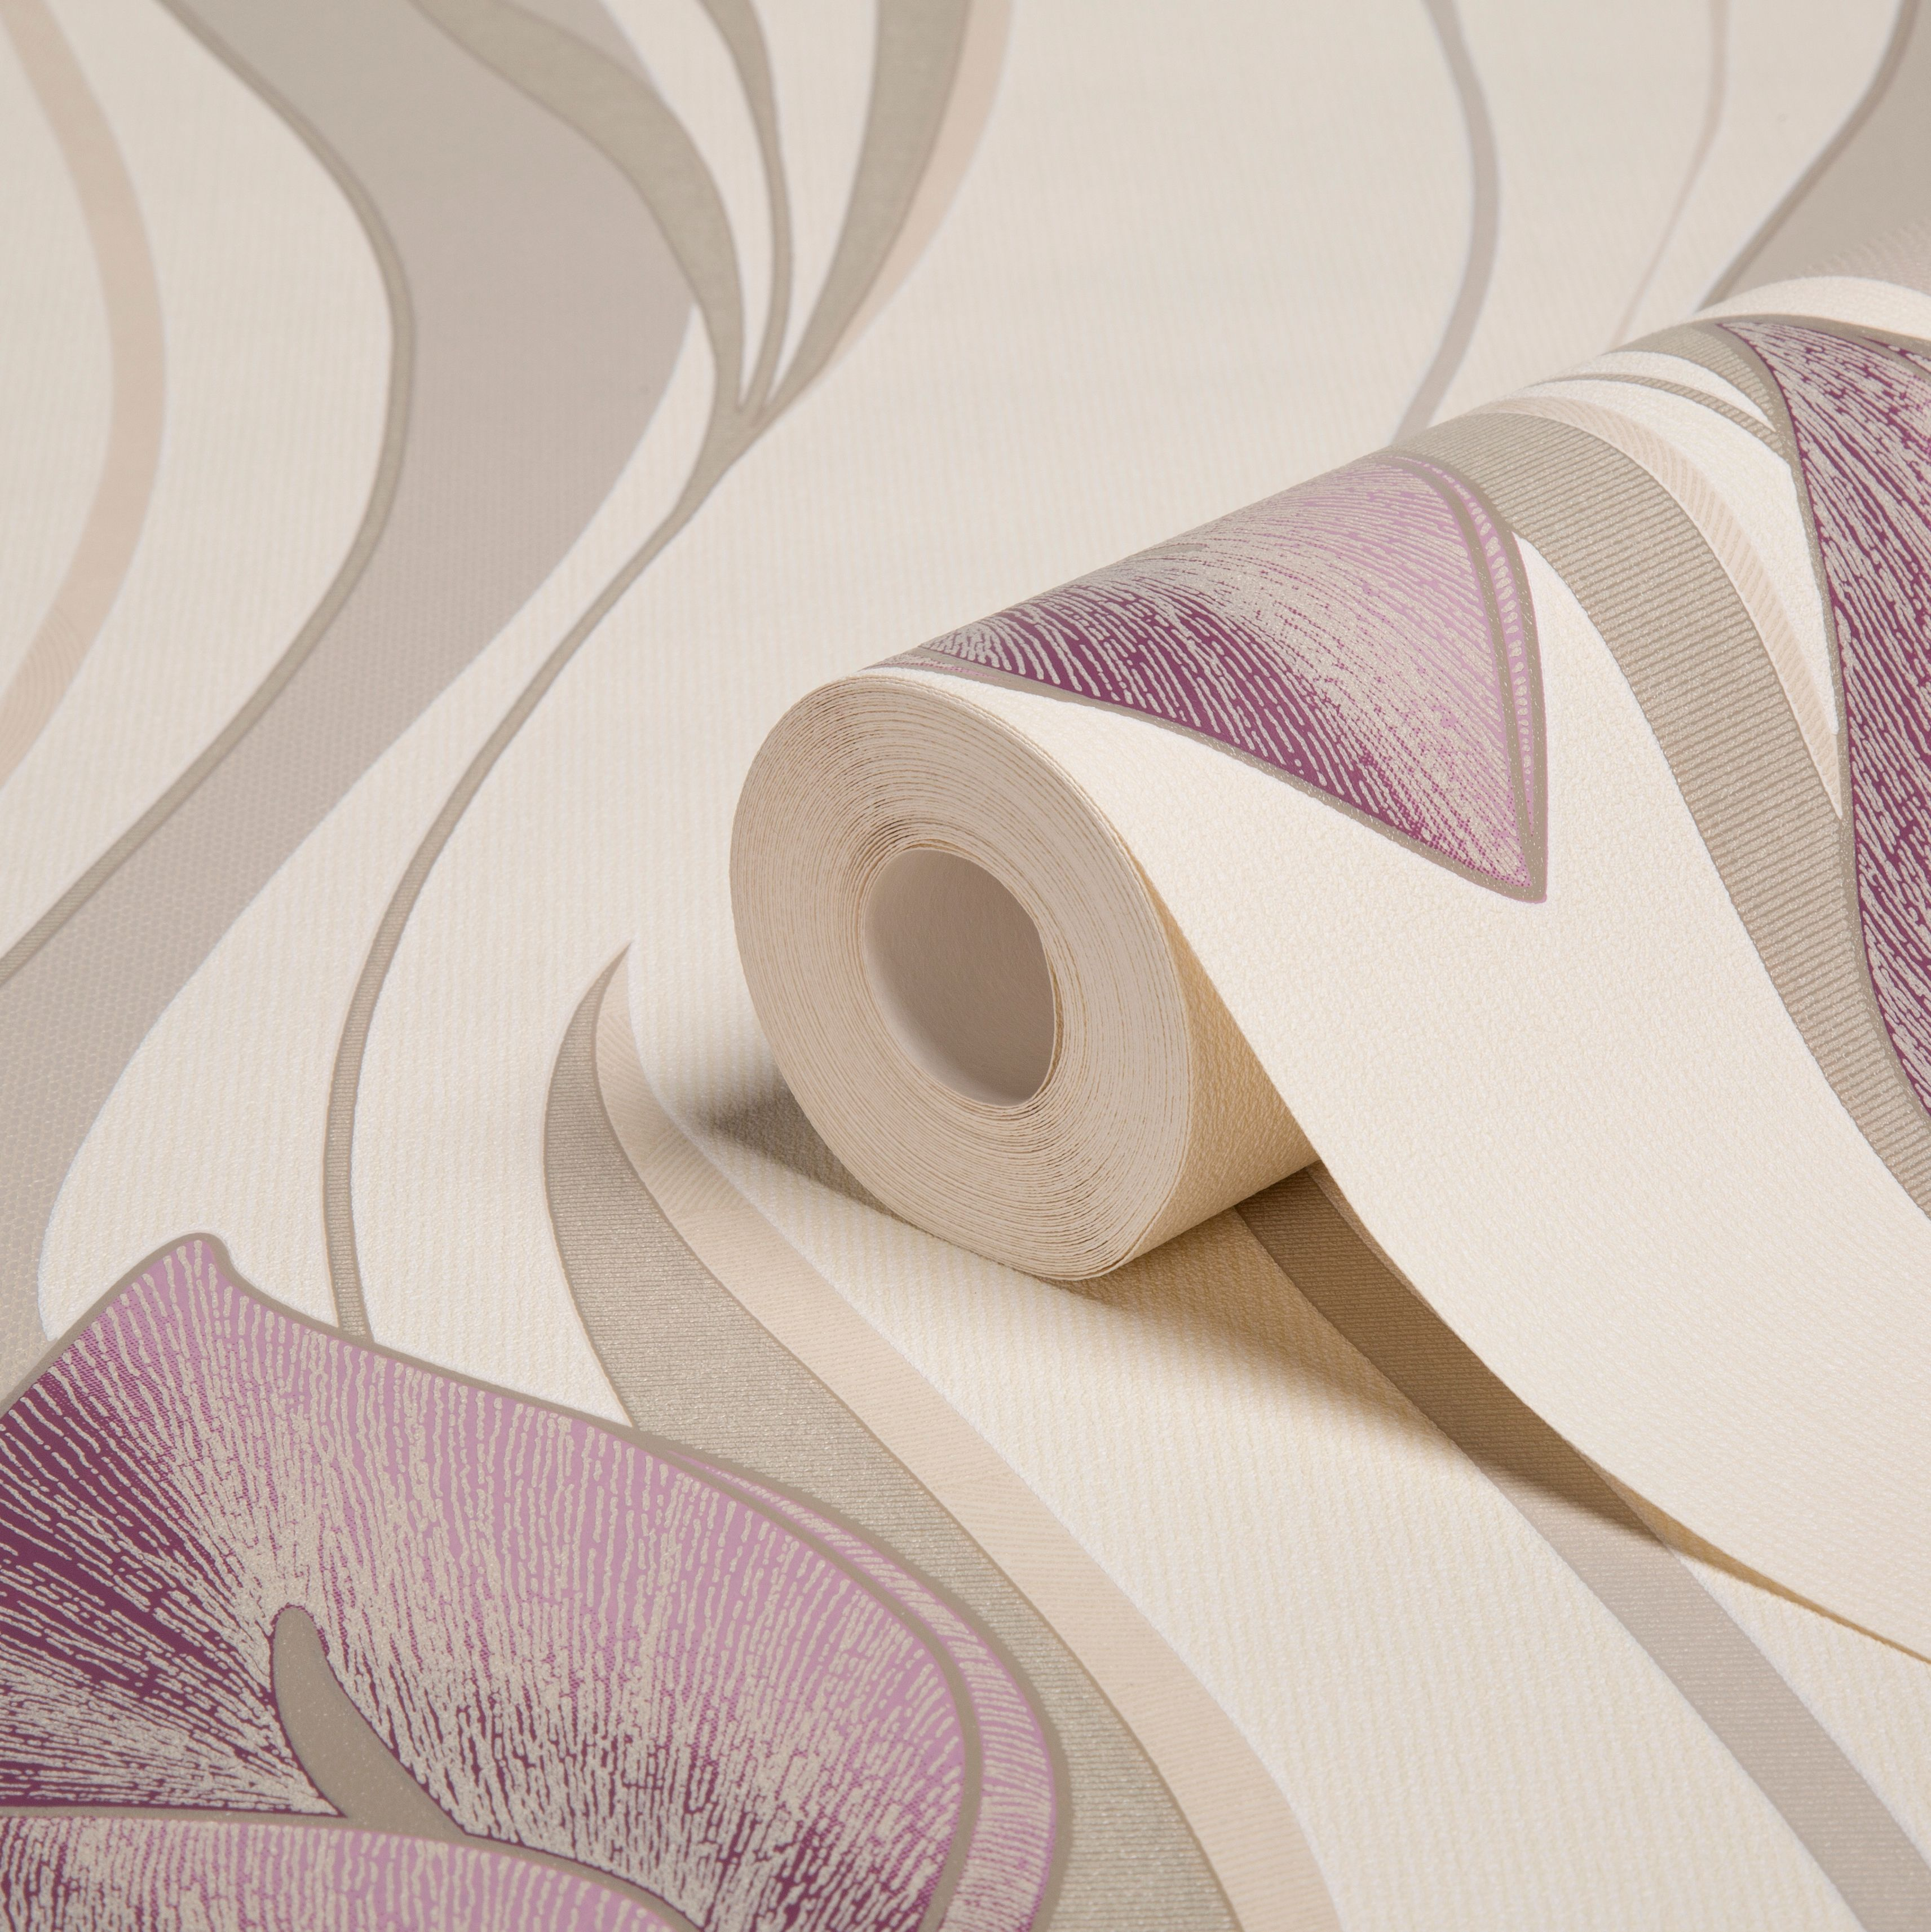 Home diy wallpaper illustration arthouse imagine fern plum motif vinyl - Graham Brown Superfresco Cream Plum Floral Wallpaper